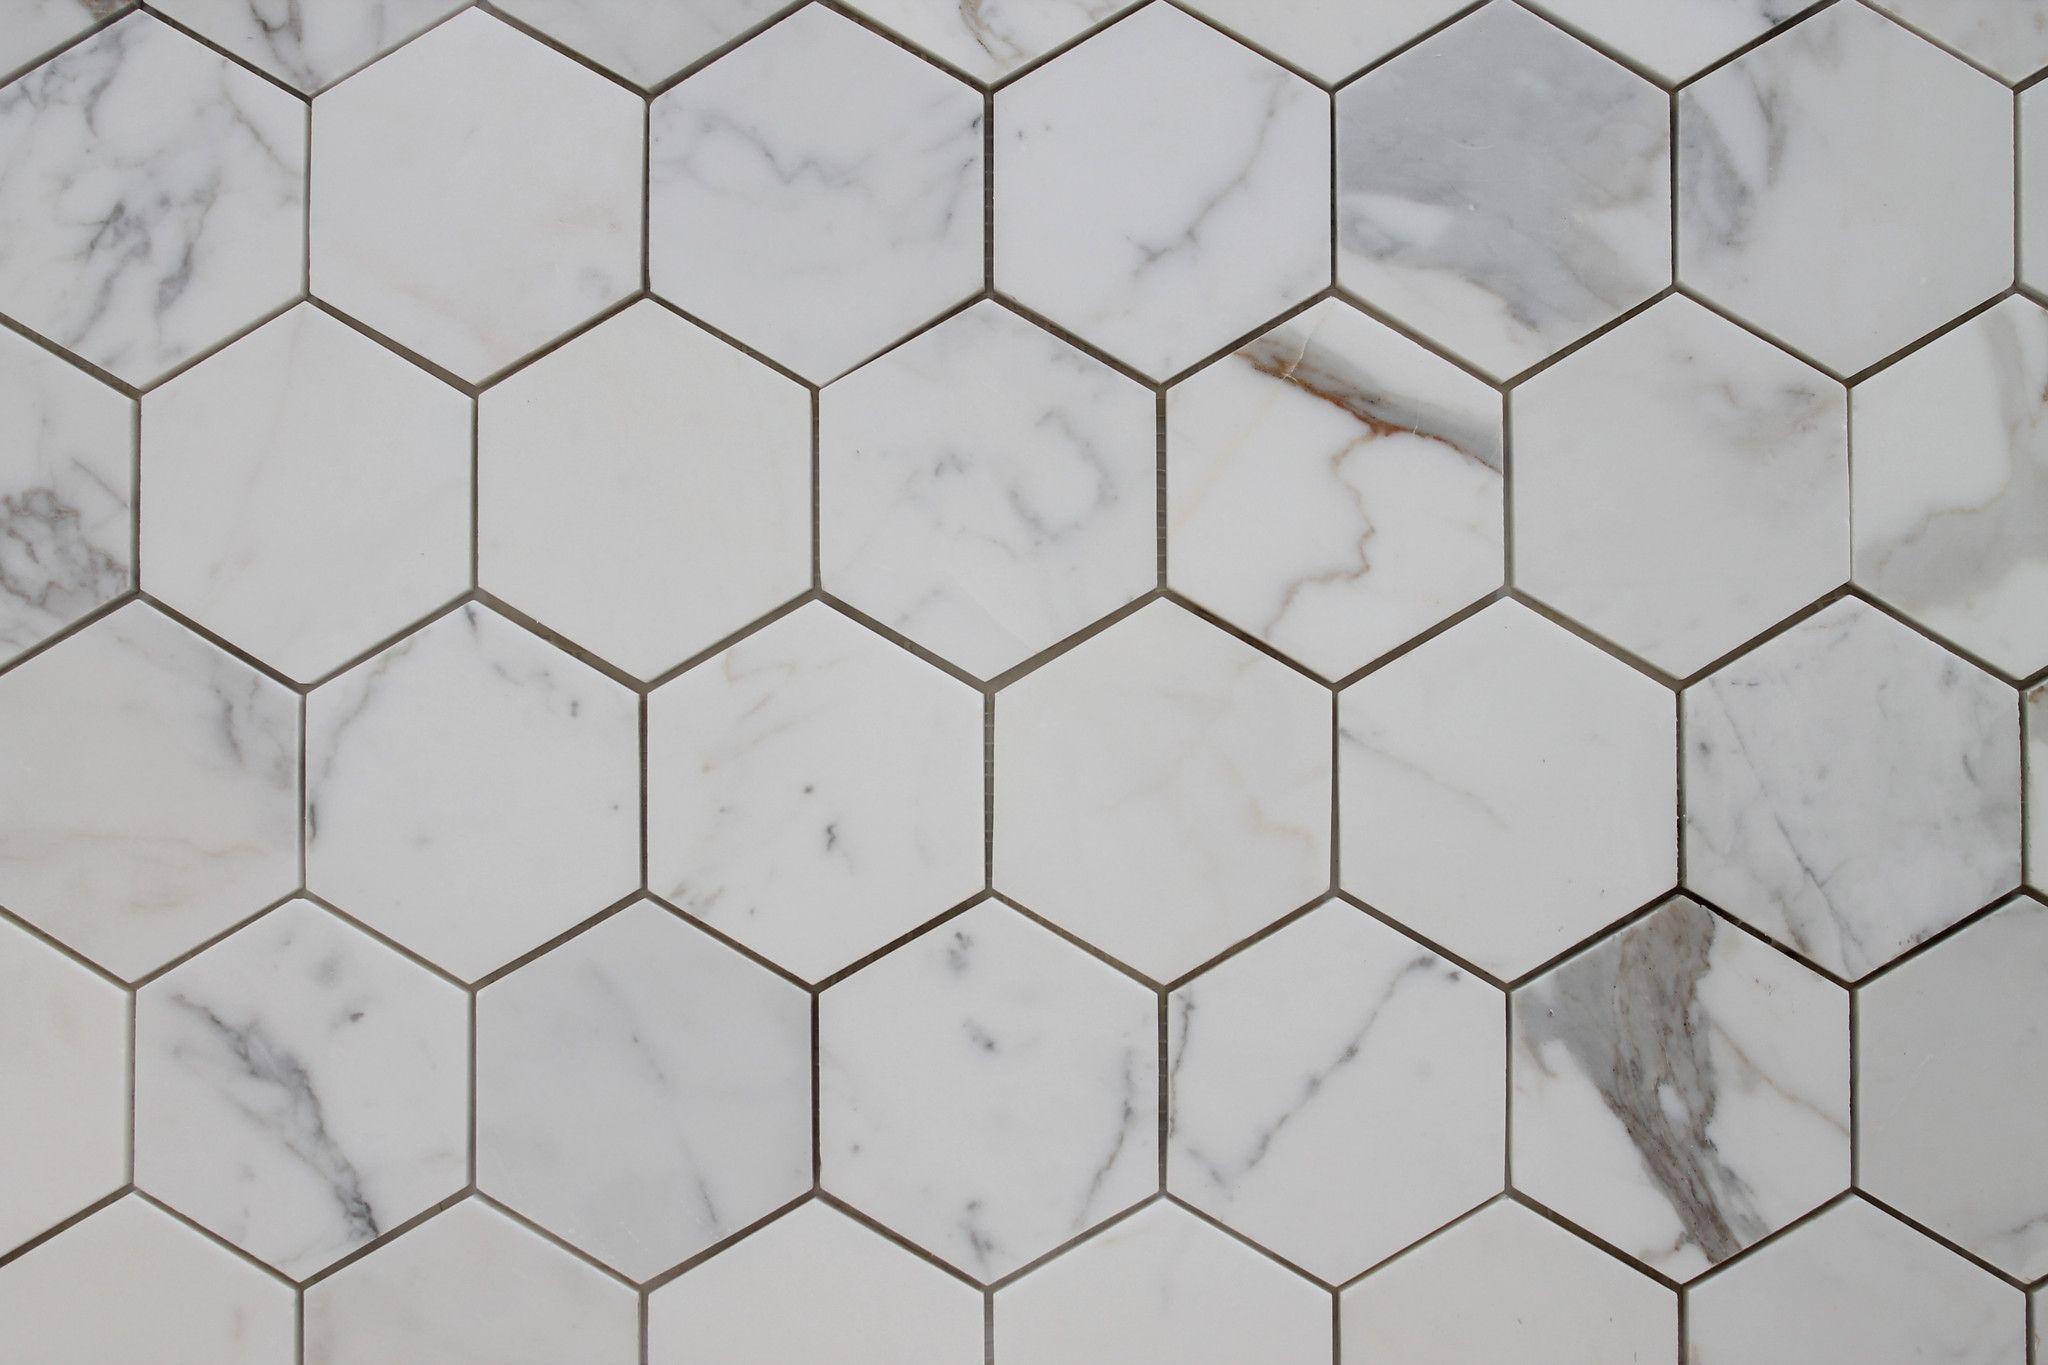 4 hexagon calacatta gold polished marble mosaic tiles